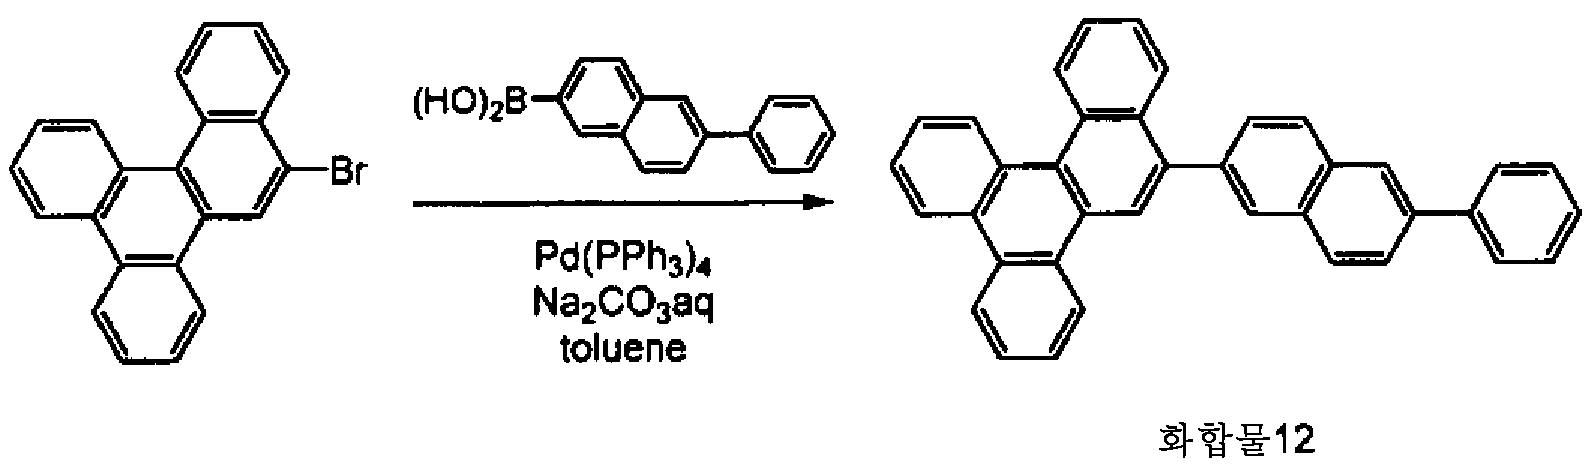 Figure 112010031772612-pct00061